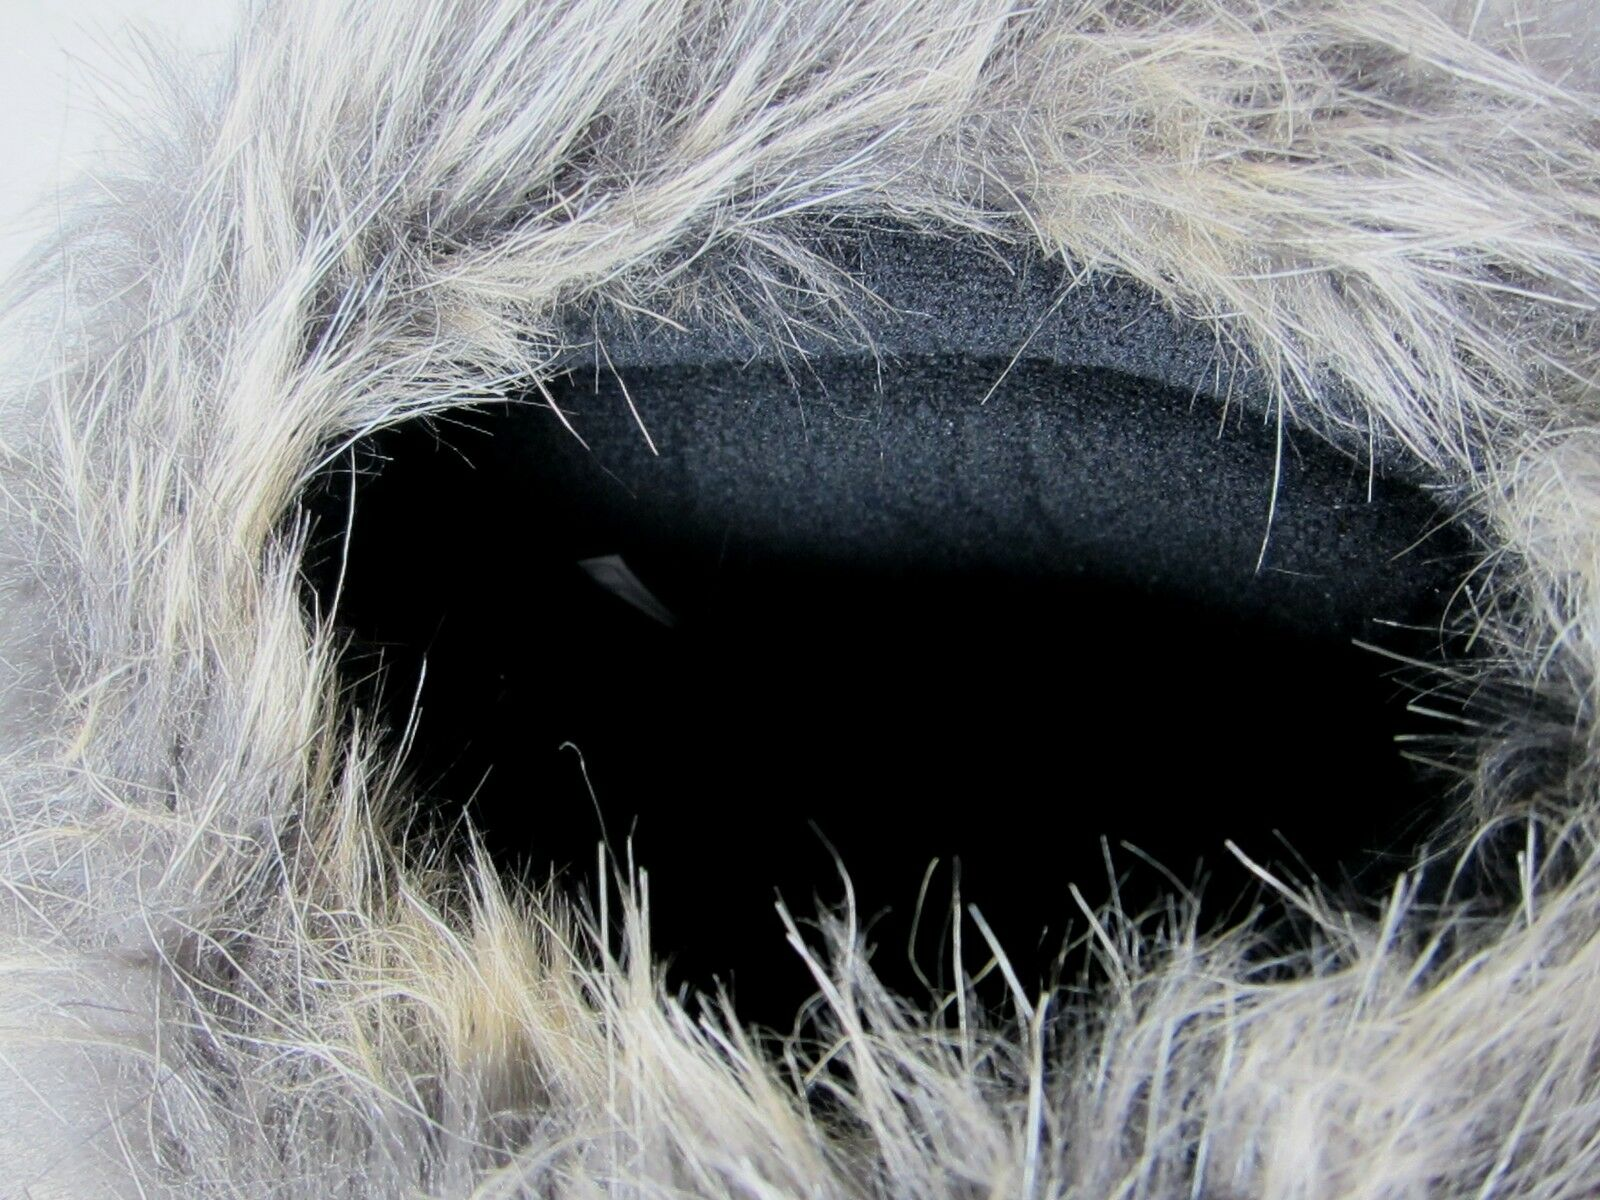 Tecnica Gr MOON BOOT Romance schwarz Gr Tecnica 31 - 34 Moon Stiefel Kunstfell Fell fake fur da767f